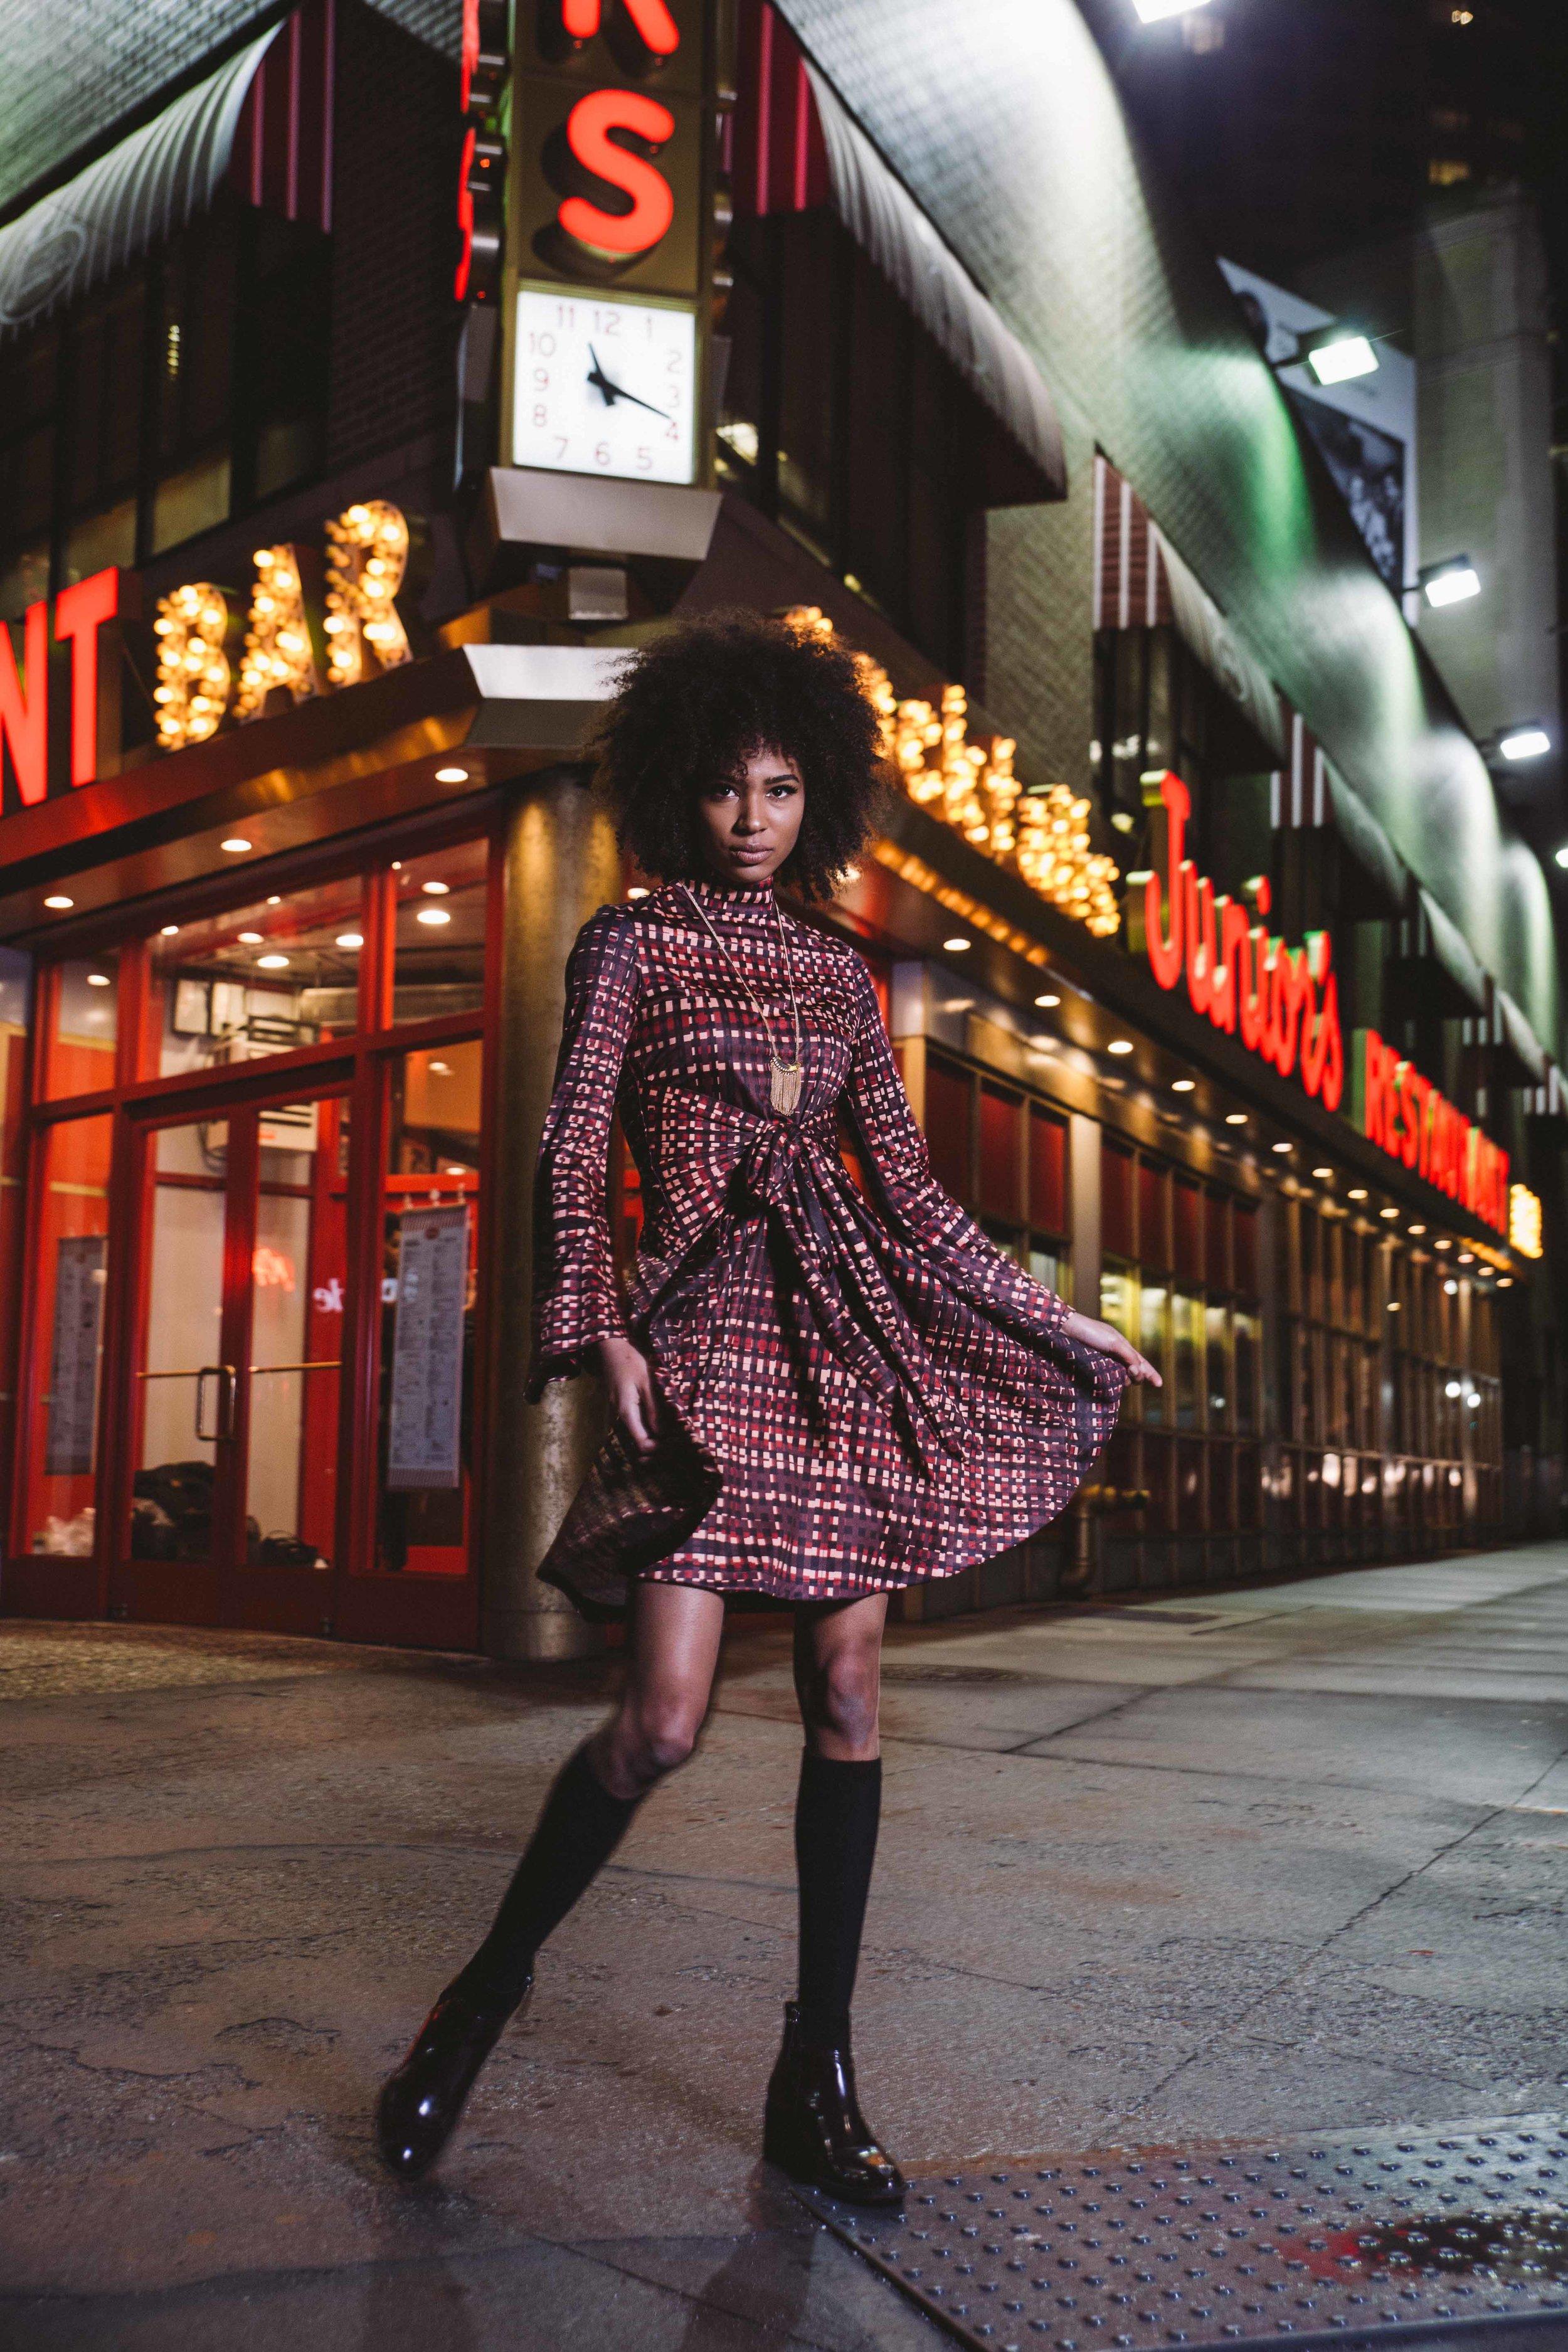 marrisa_wilson_ny_valerie_wrap_dress.jpg